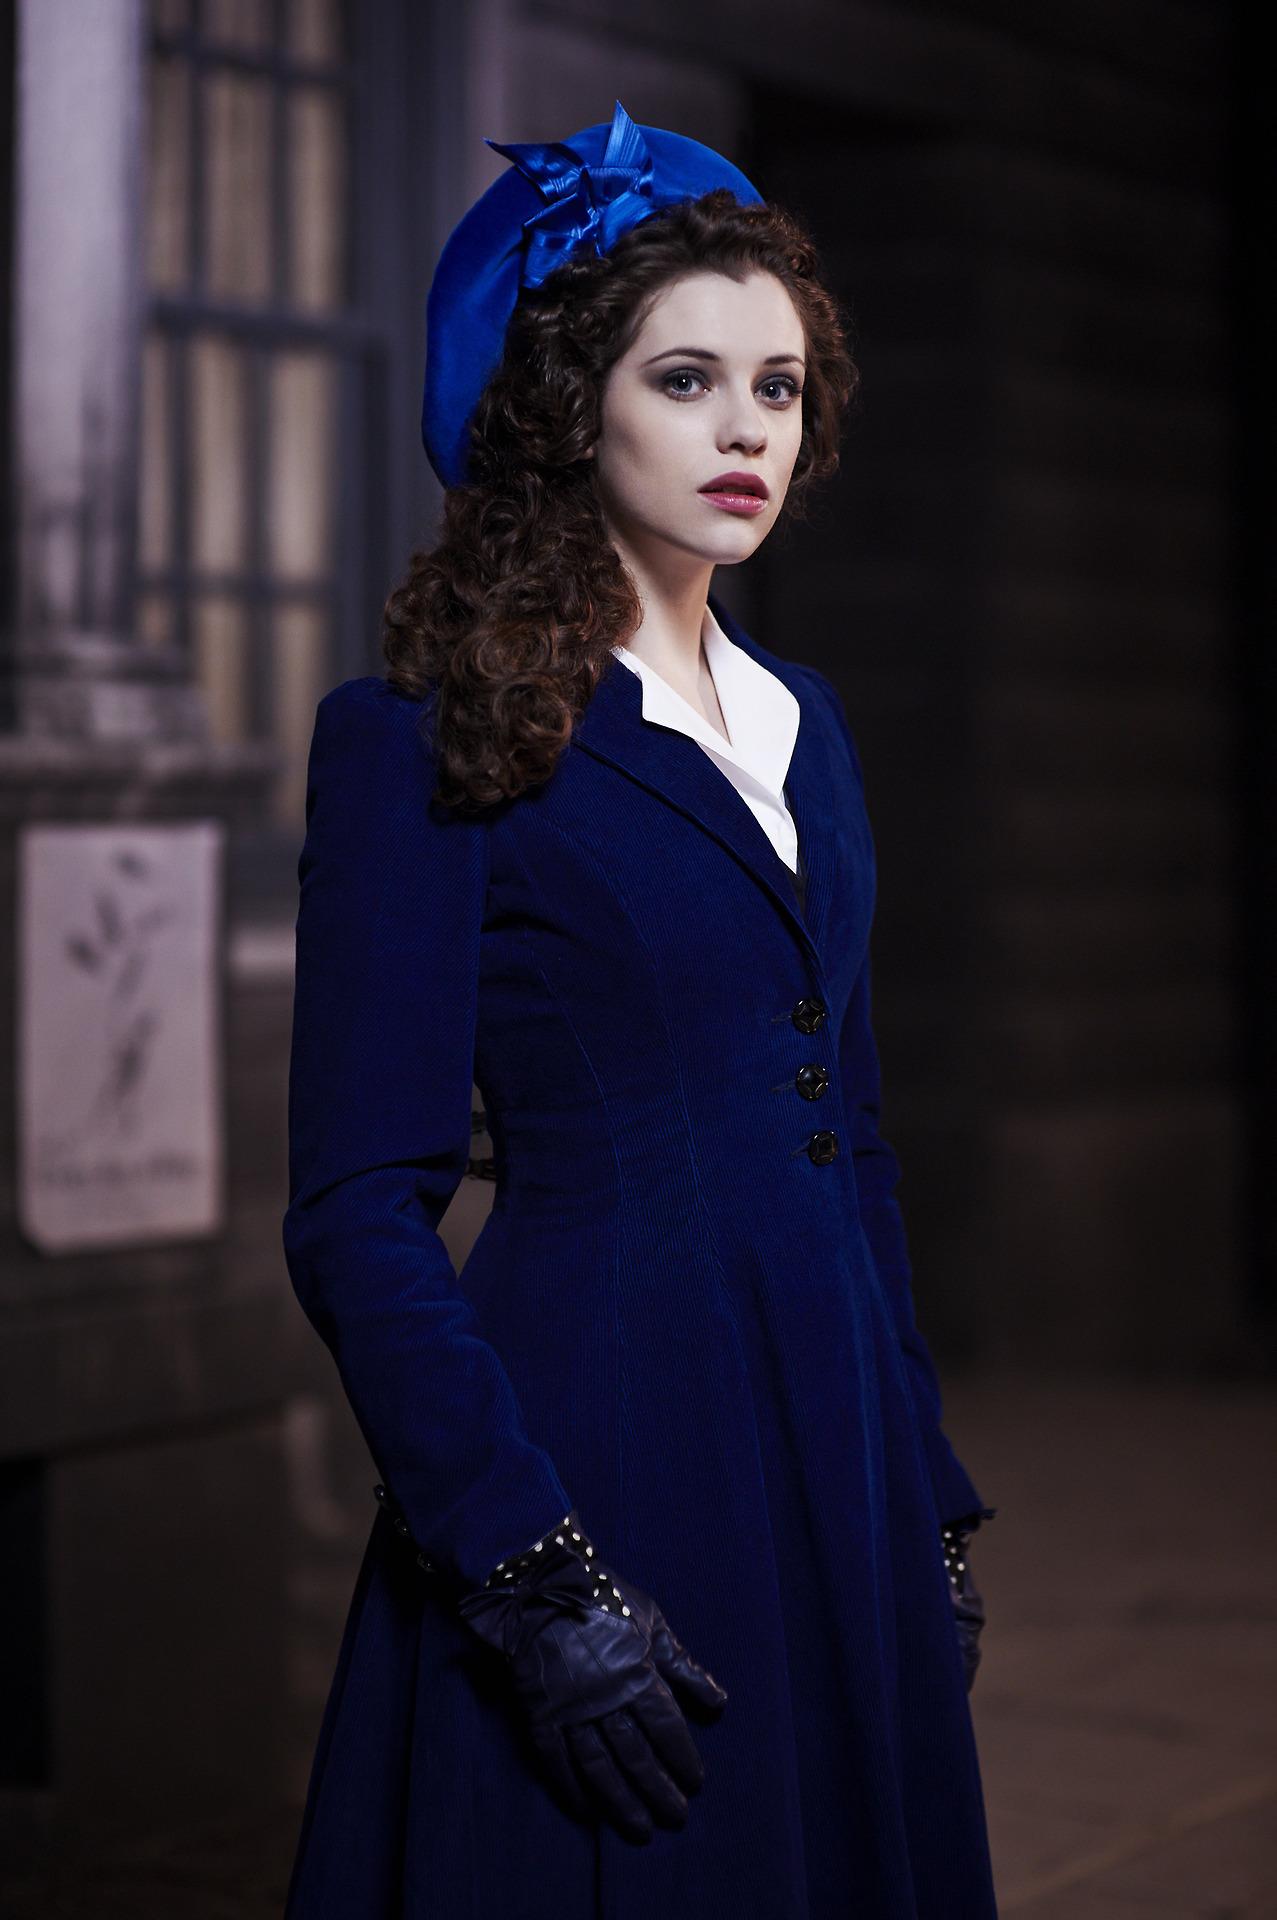 Mina - Dracula NBC Photo (35893021) - Fanpop